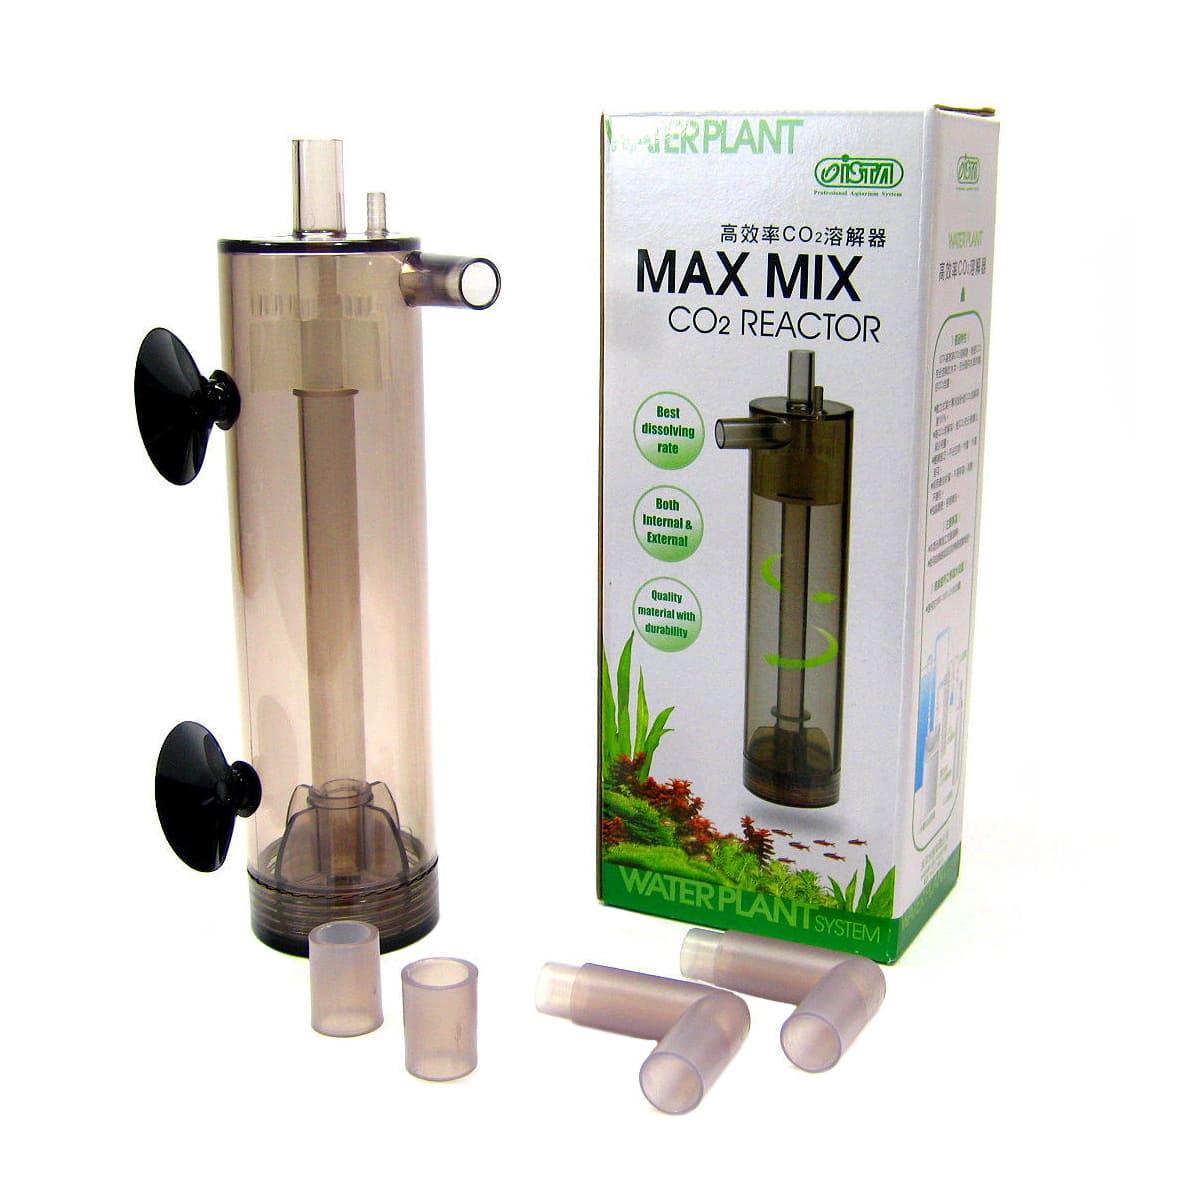 ISTA REATOR DE CO2 PARA AQUÁRIOS MAX MIX CO2 REACTOR M I-528